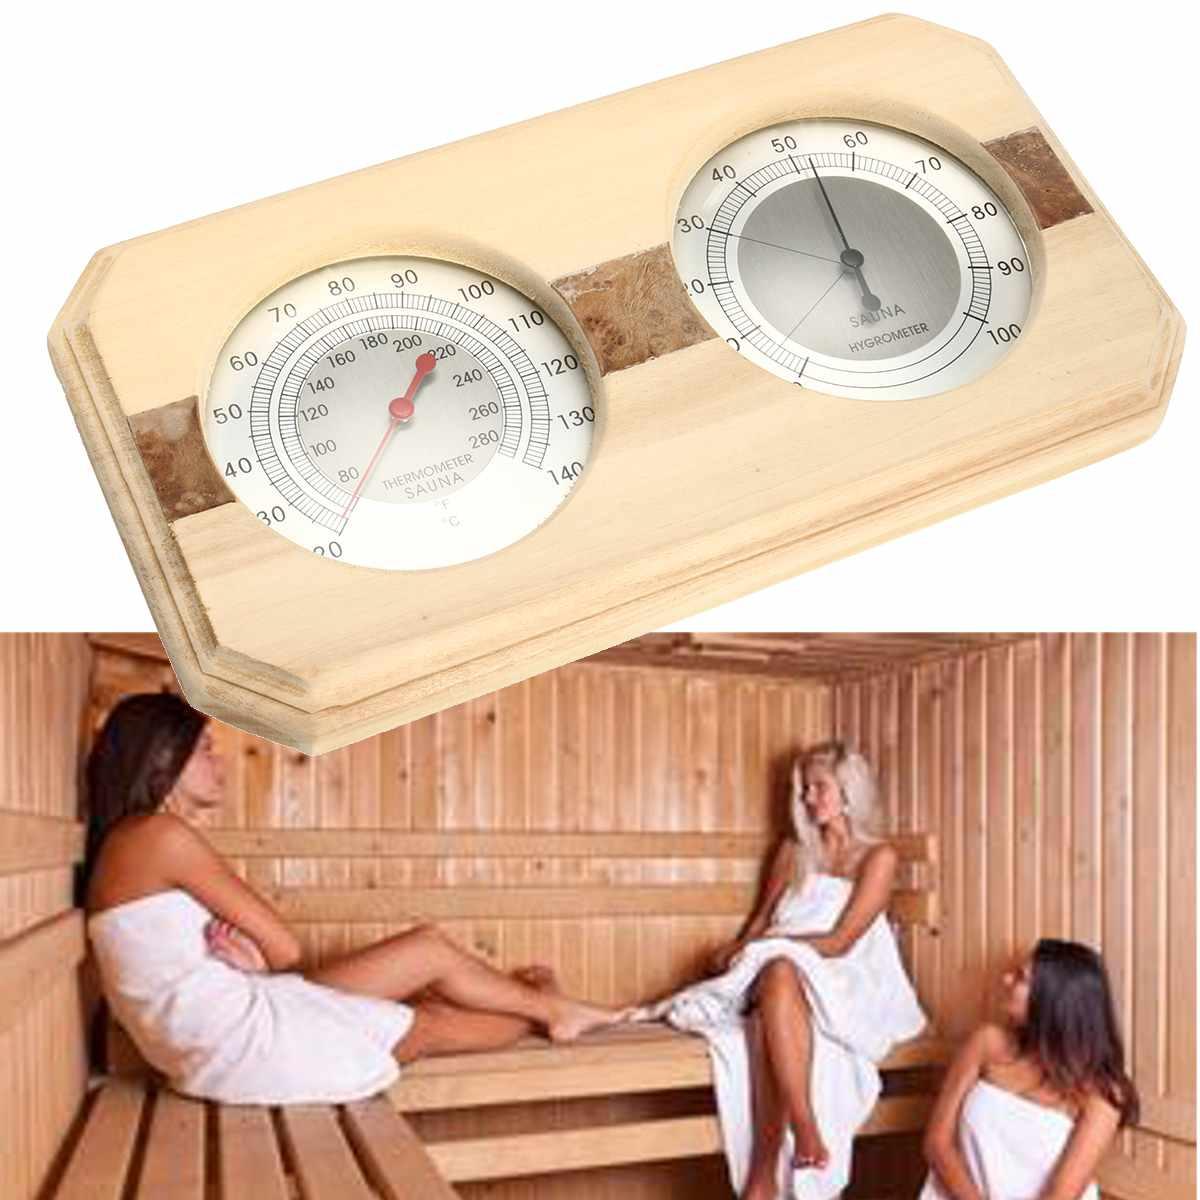 2 In 1 Sauna Room Wood Thermometer Hygrometer Steam Sauna Room Thermometure Instrument Humidity Meter Bath And Sauna Indoor Use2 In 1 Sauna Room Wood Thermometer Hygrometer Steam Sauna Room Thermometure Instrument Humidity Meter Bath And Sauna Indoor Use